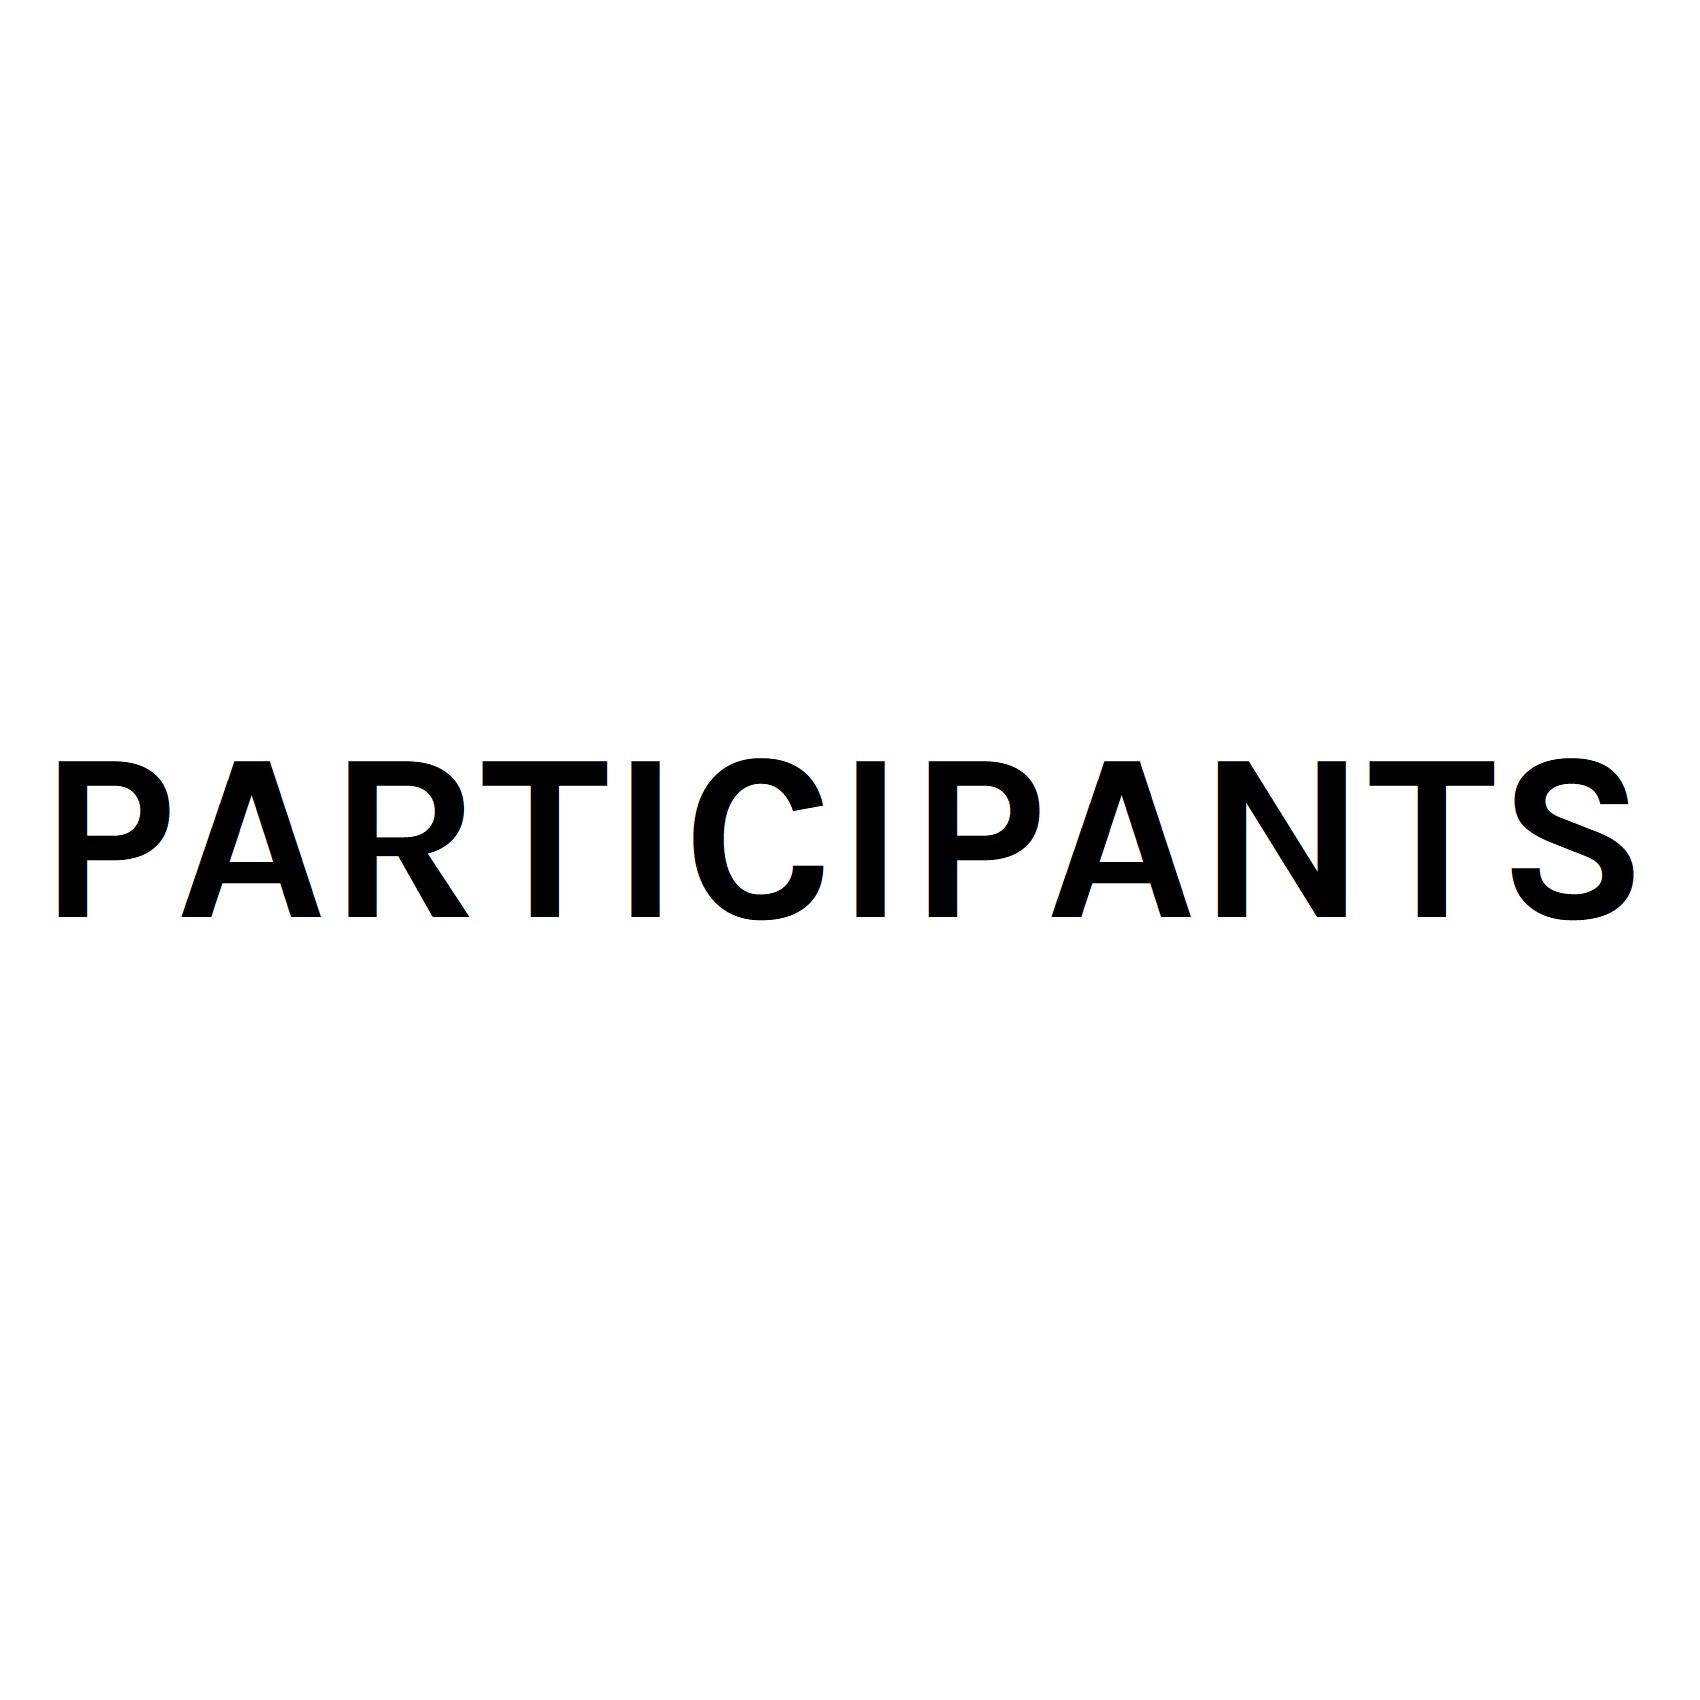 https://delosdr.org/index.php/remote-oral-advocacy-programme/participants/